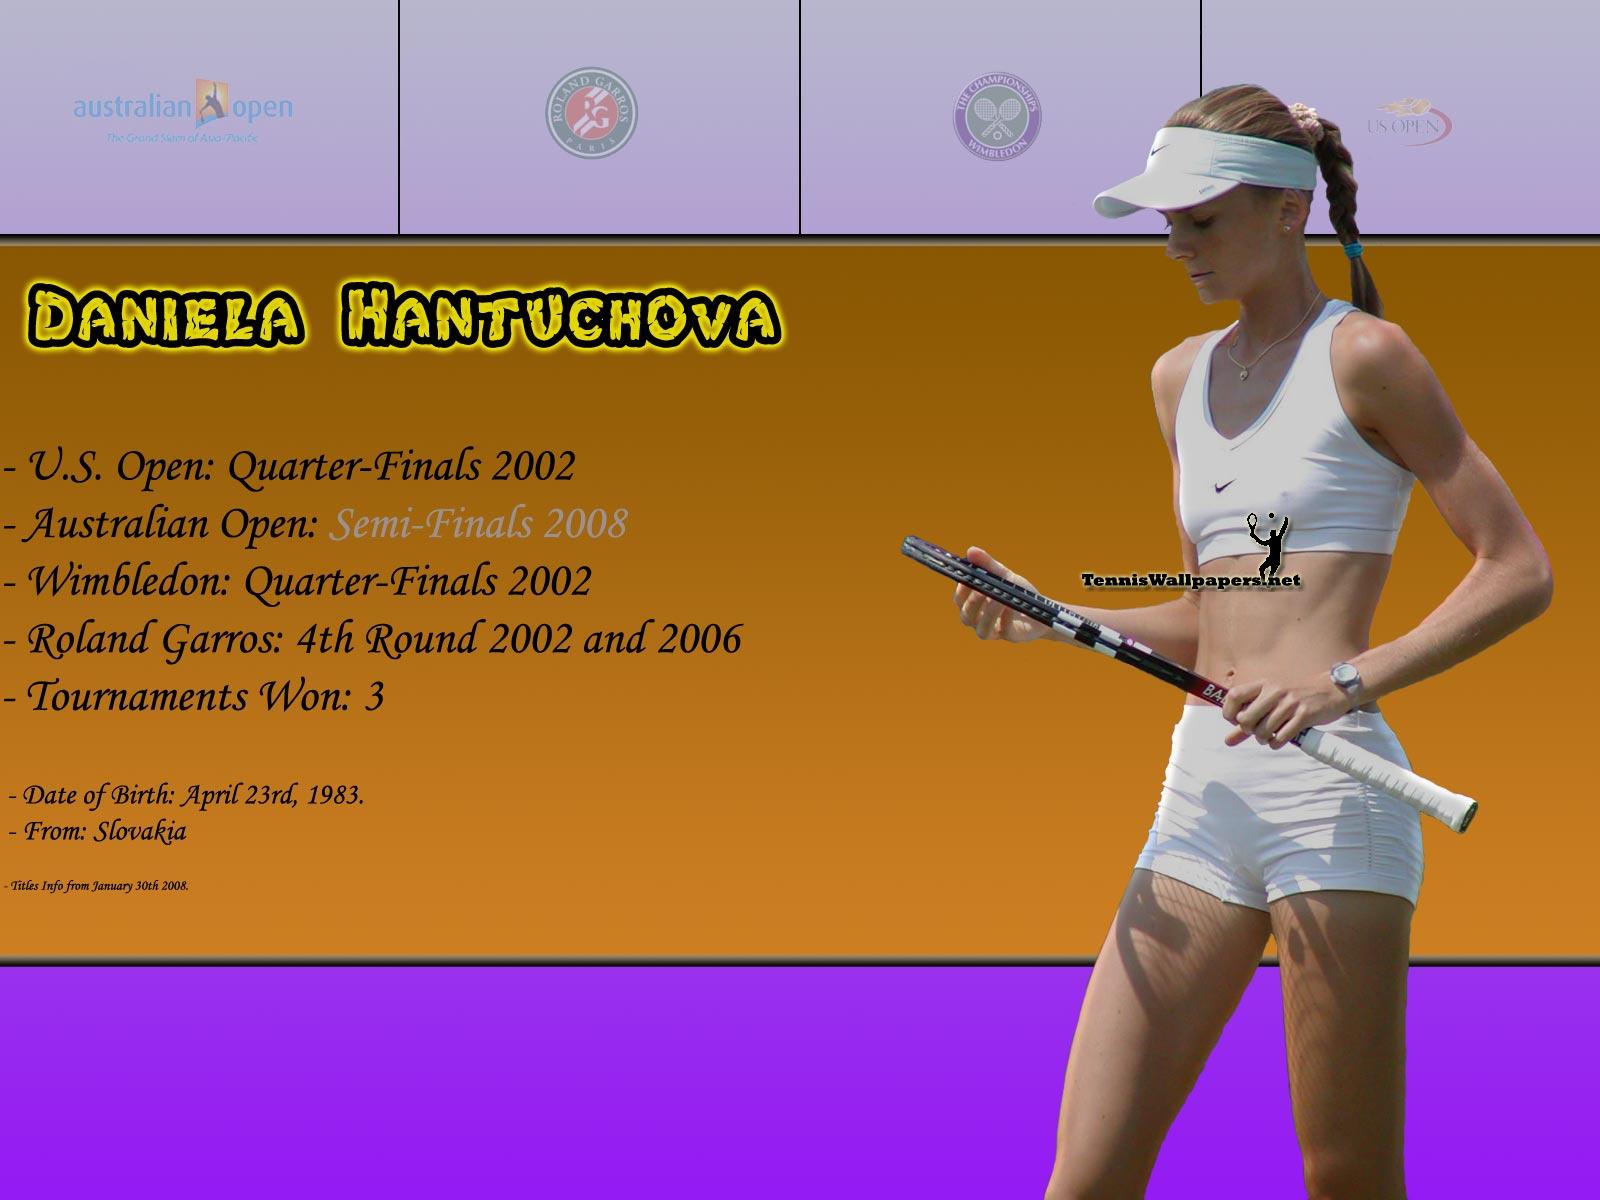 Daniela Hantuchová in Titles Info